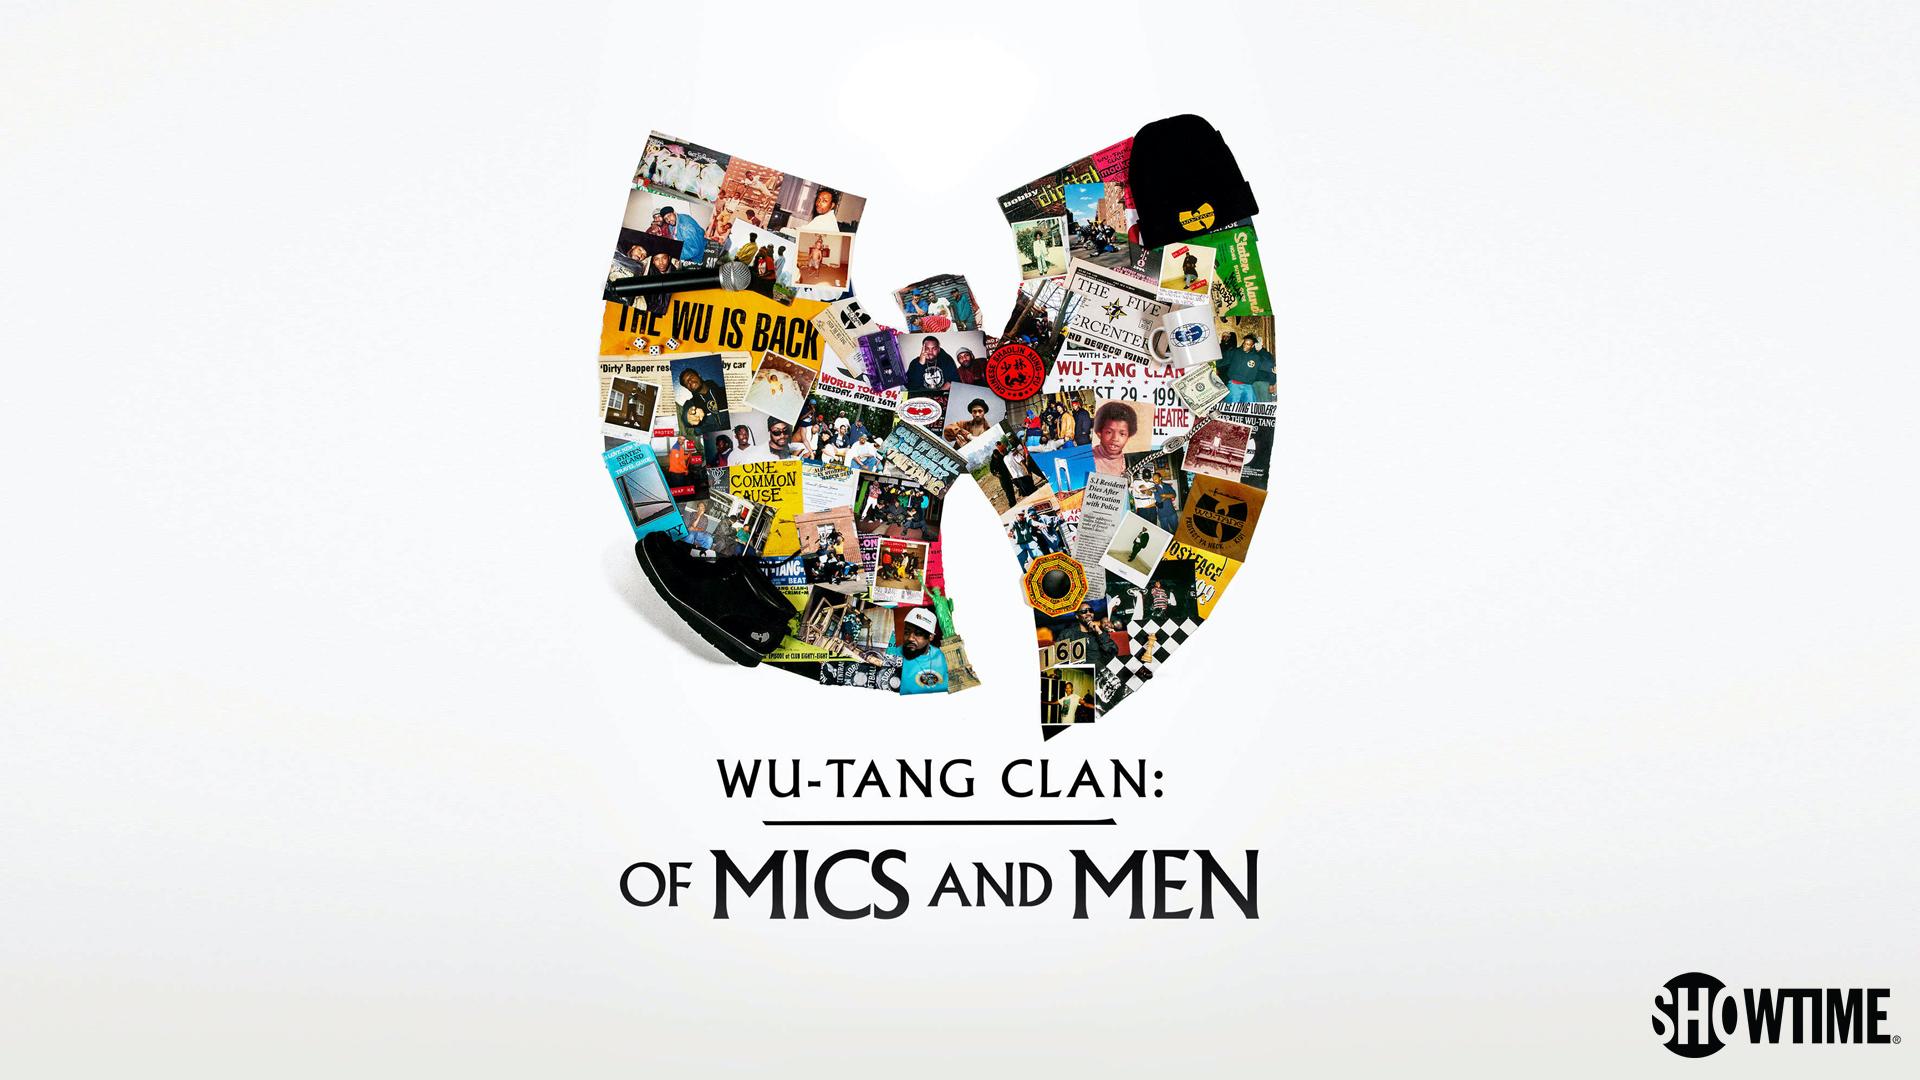 Wu-Tang Clan: Of Mics and Men Season 1